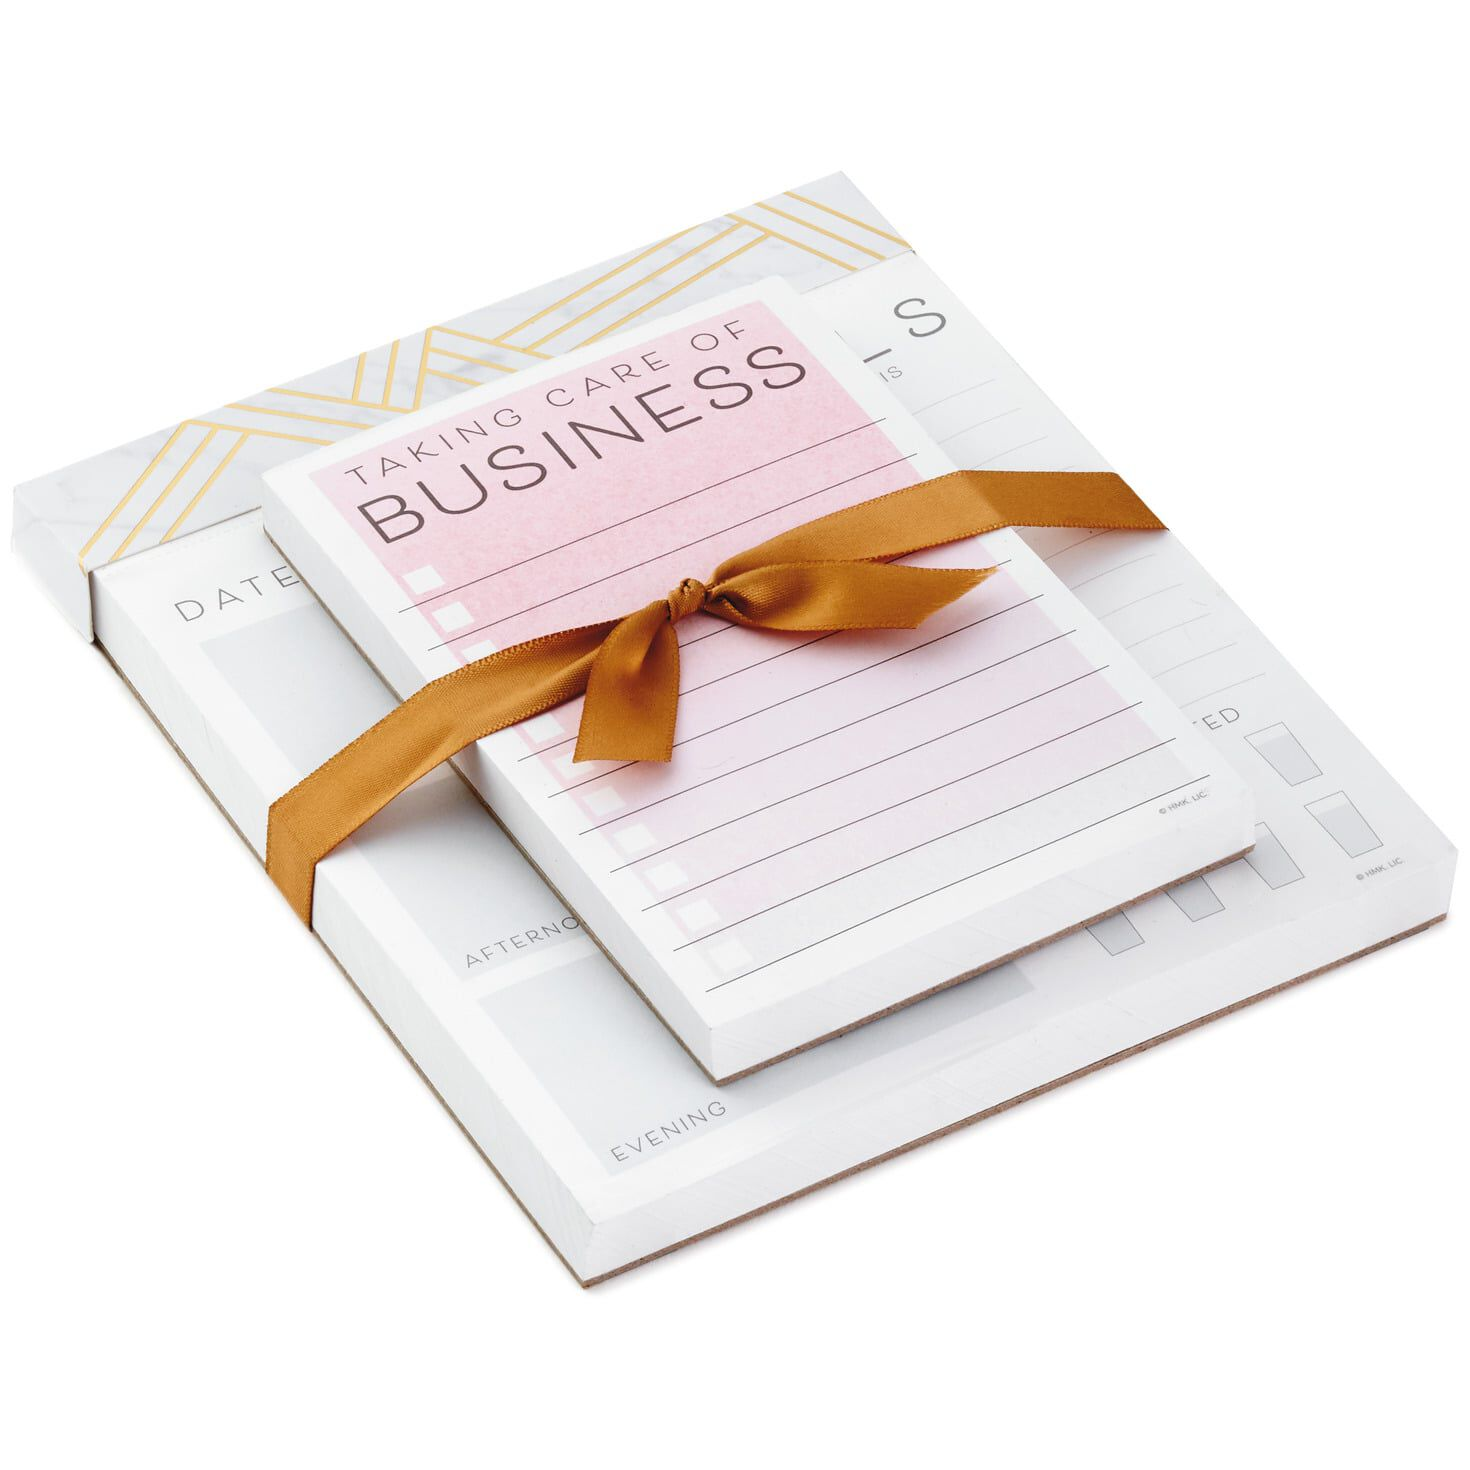 2020 Disney Alice Schedule Book Calendar Cute Diary Note Planner Monthly Wonder